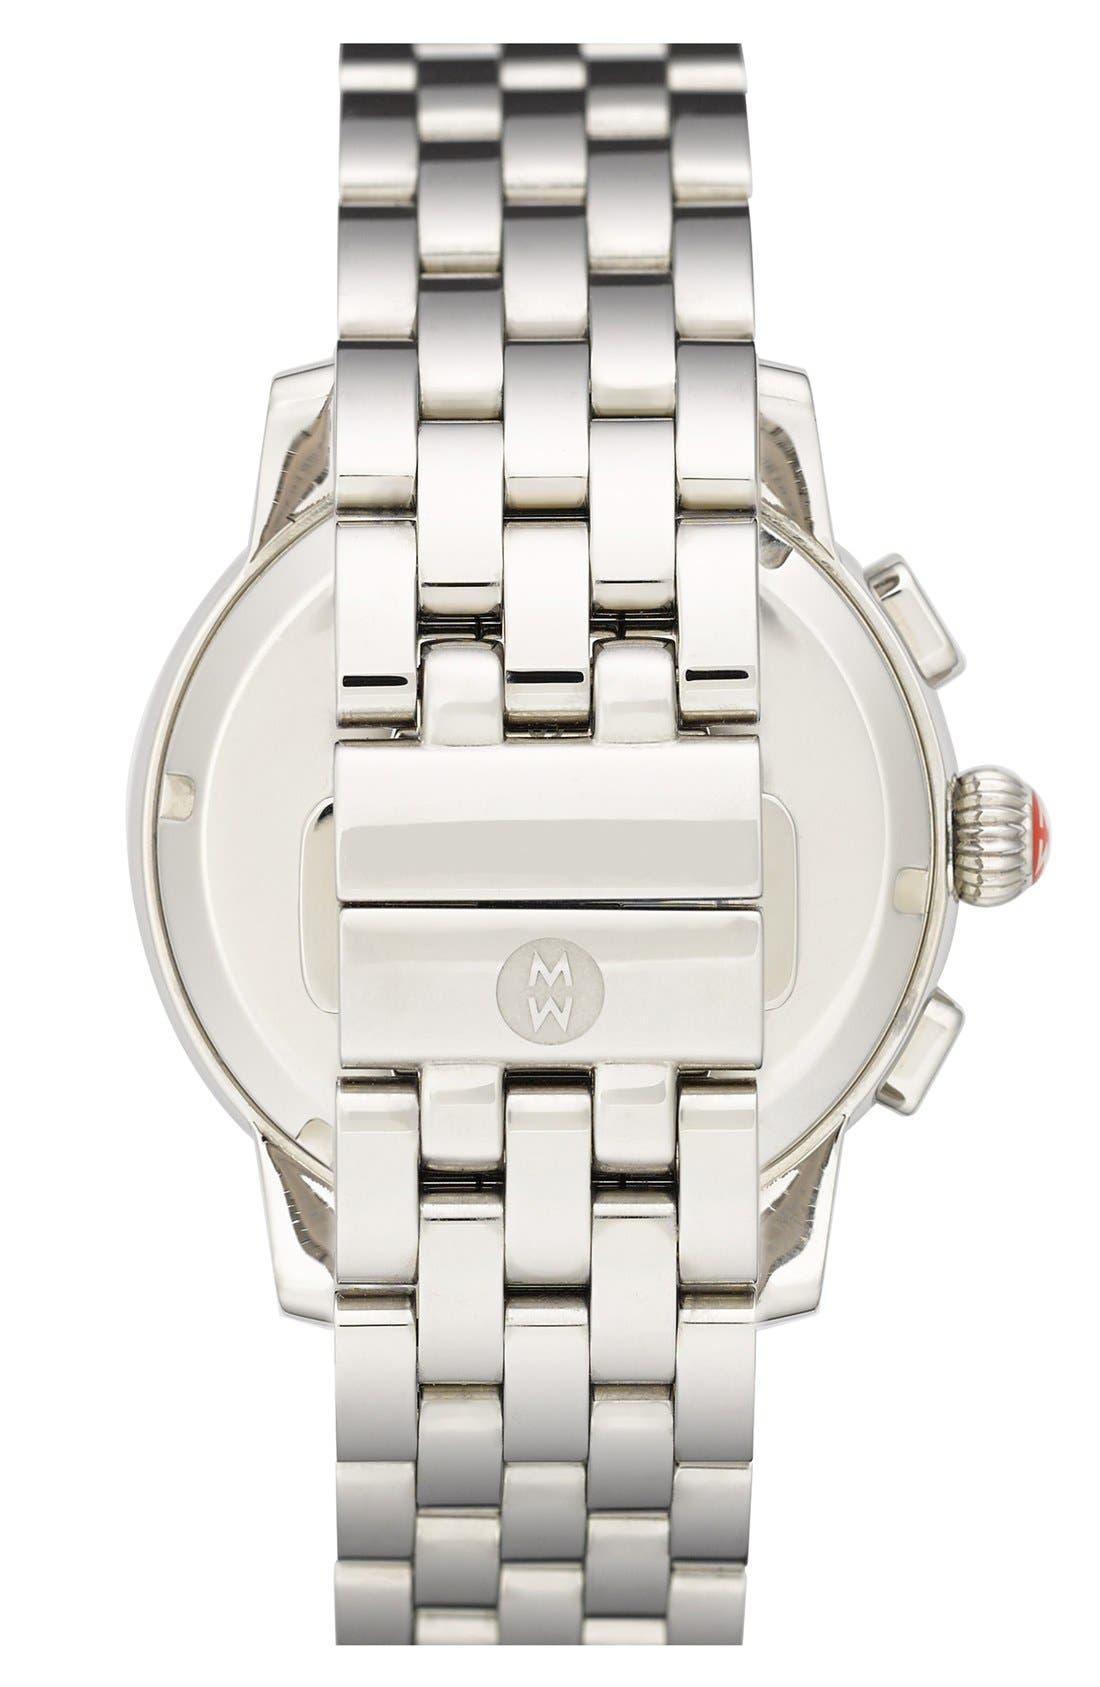 Alternate Image 2  - MICHELE 'Uptown' Diamond Dial Chronograph Watch Case & Bracelet, 39mm